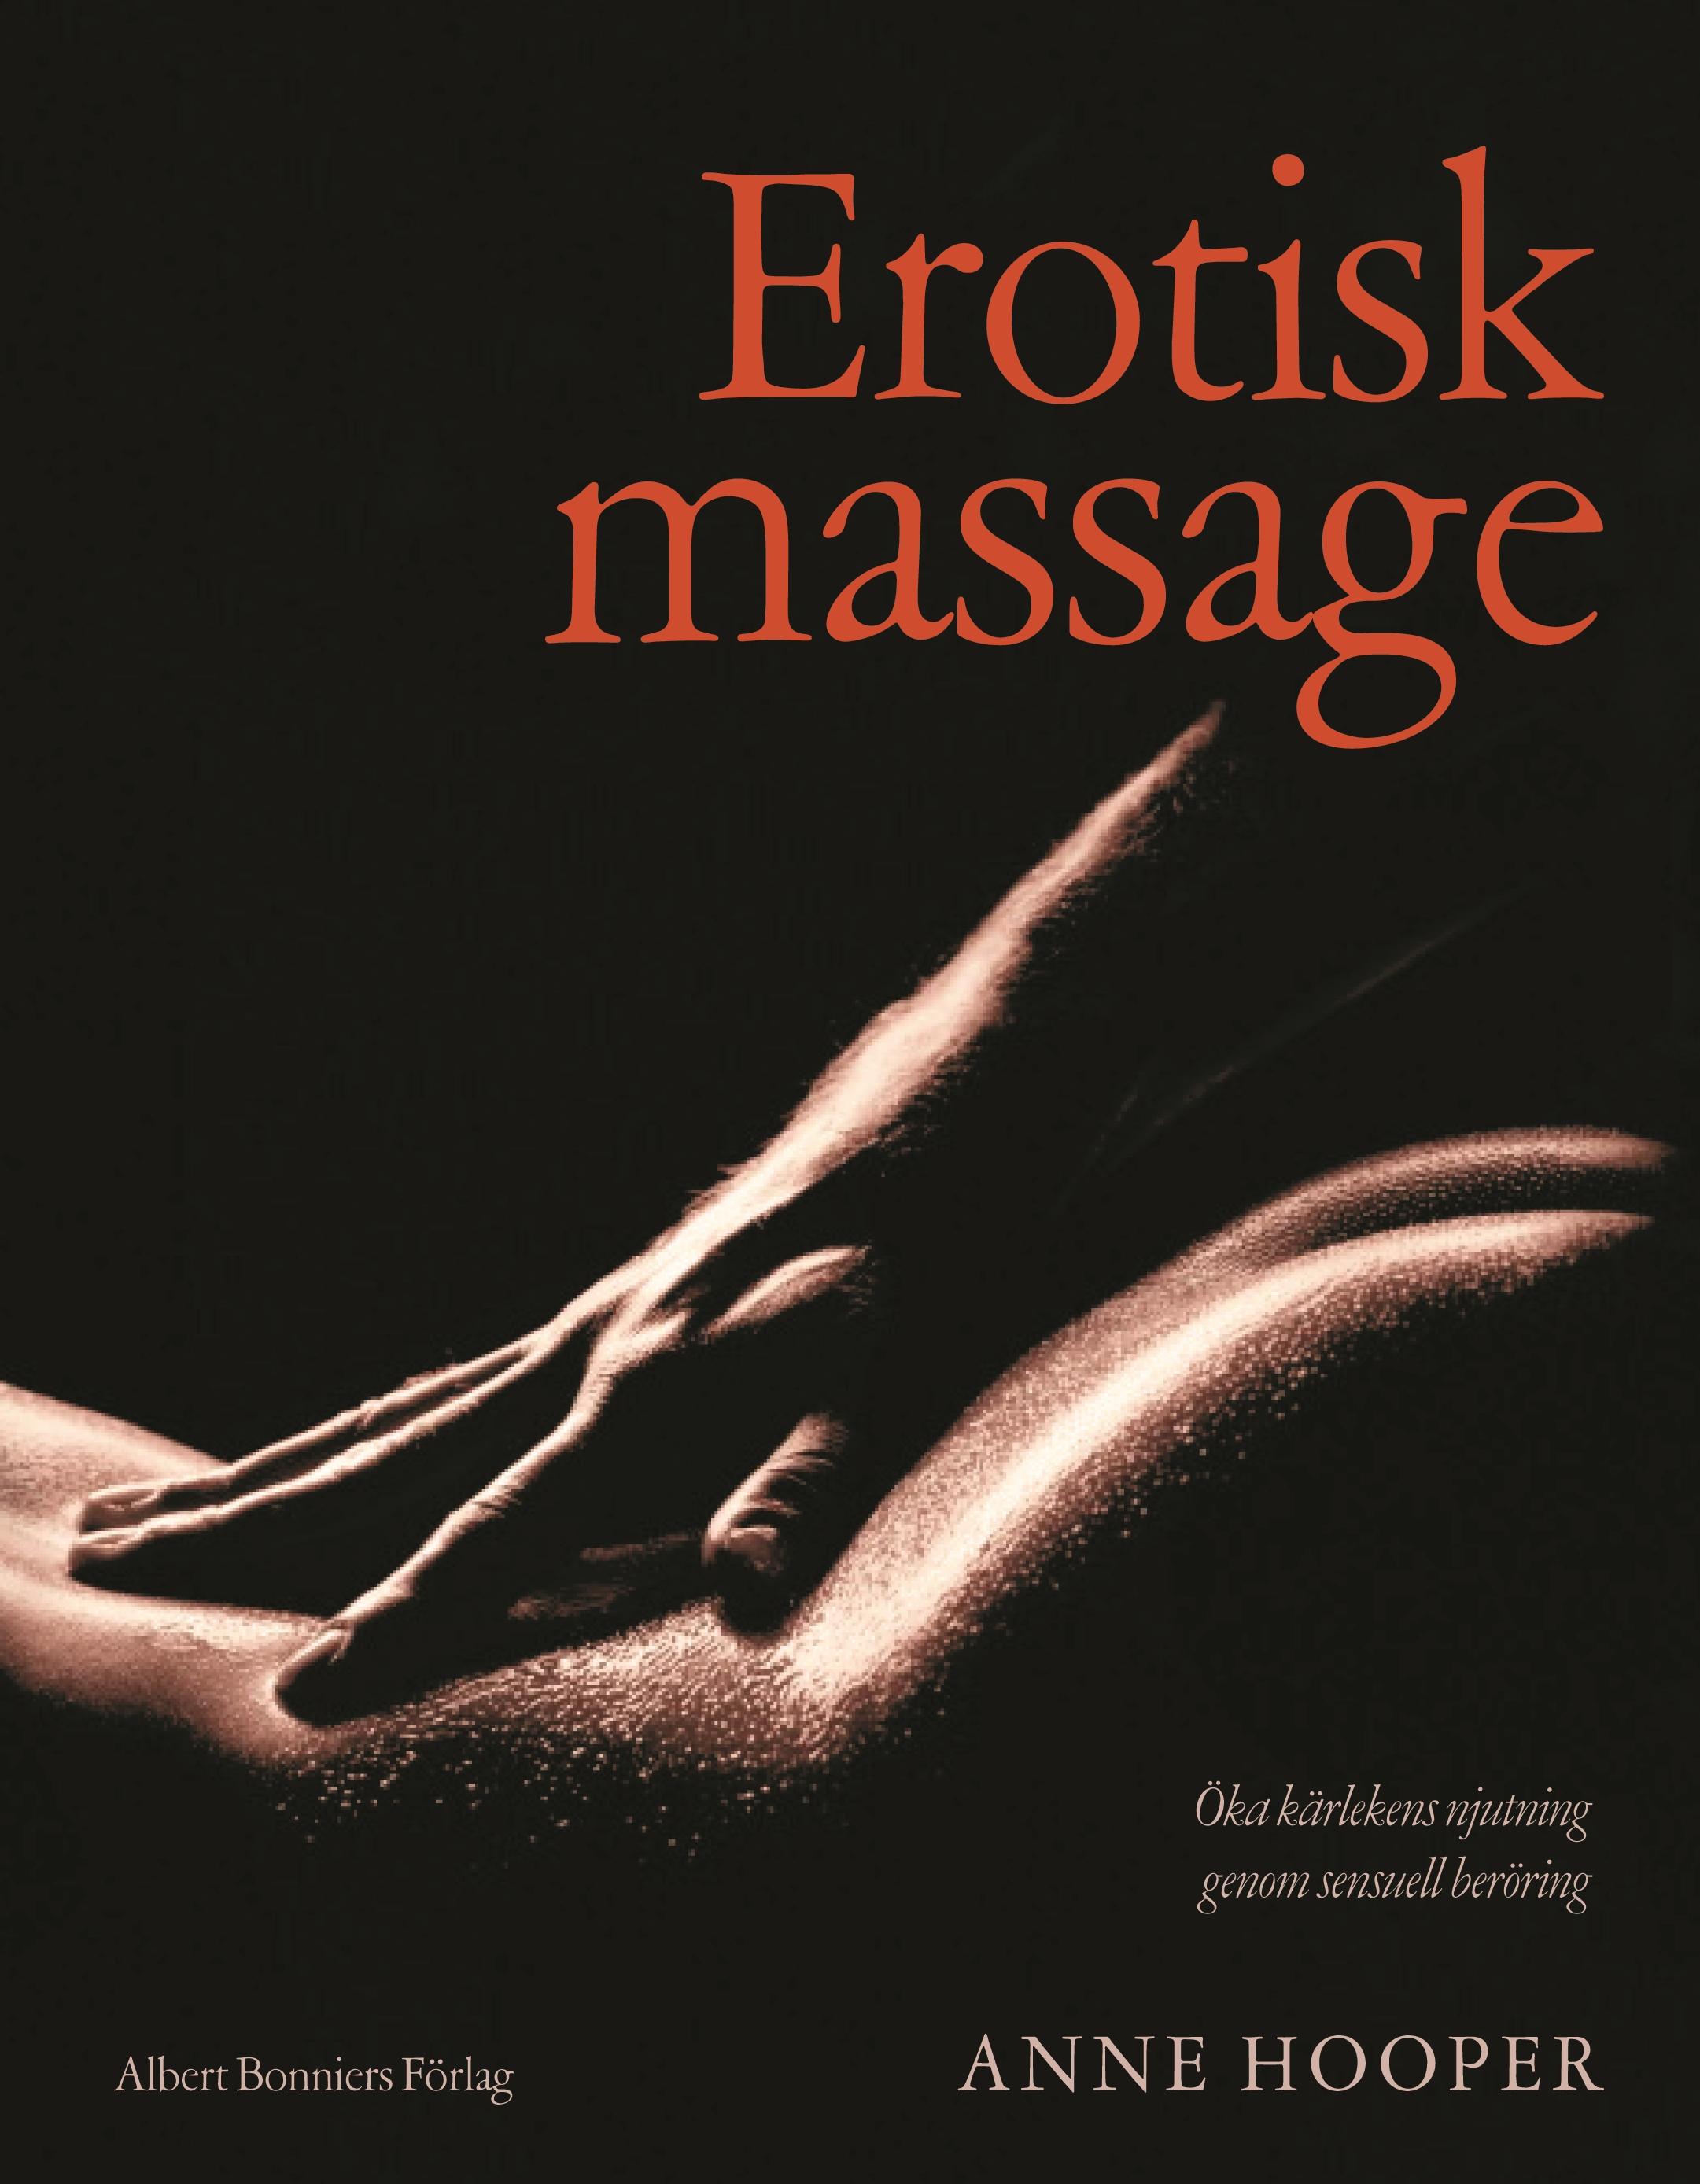 sociala media massage fantasi i Stockholm